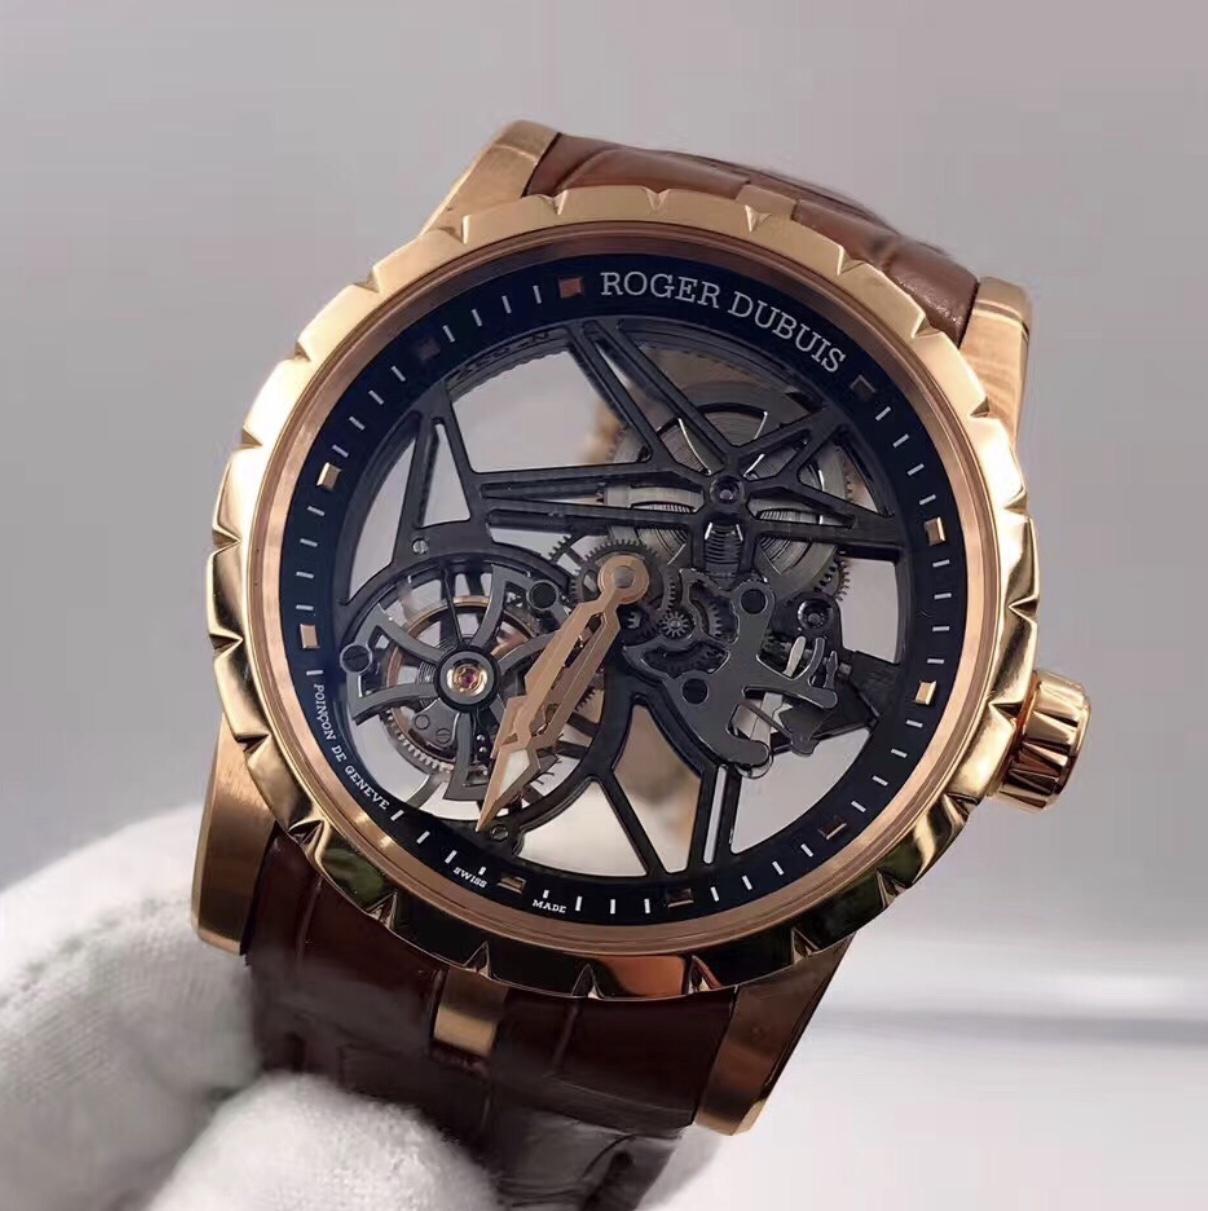 dd1f08c7694 Roger Dubuis EXCALIBUR 42 Skeleton Tourbillon Pink Gold RDDBEX0392 –  Watchesmiles